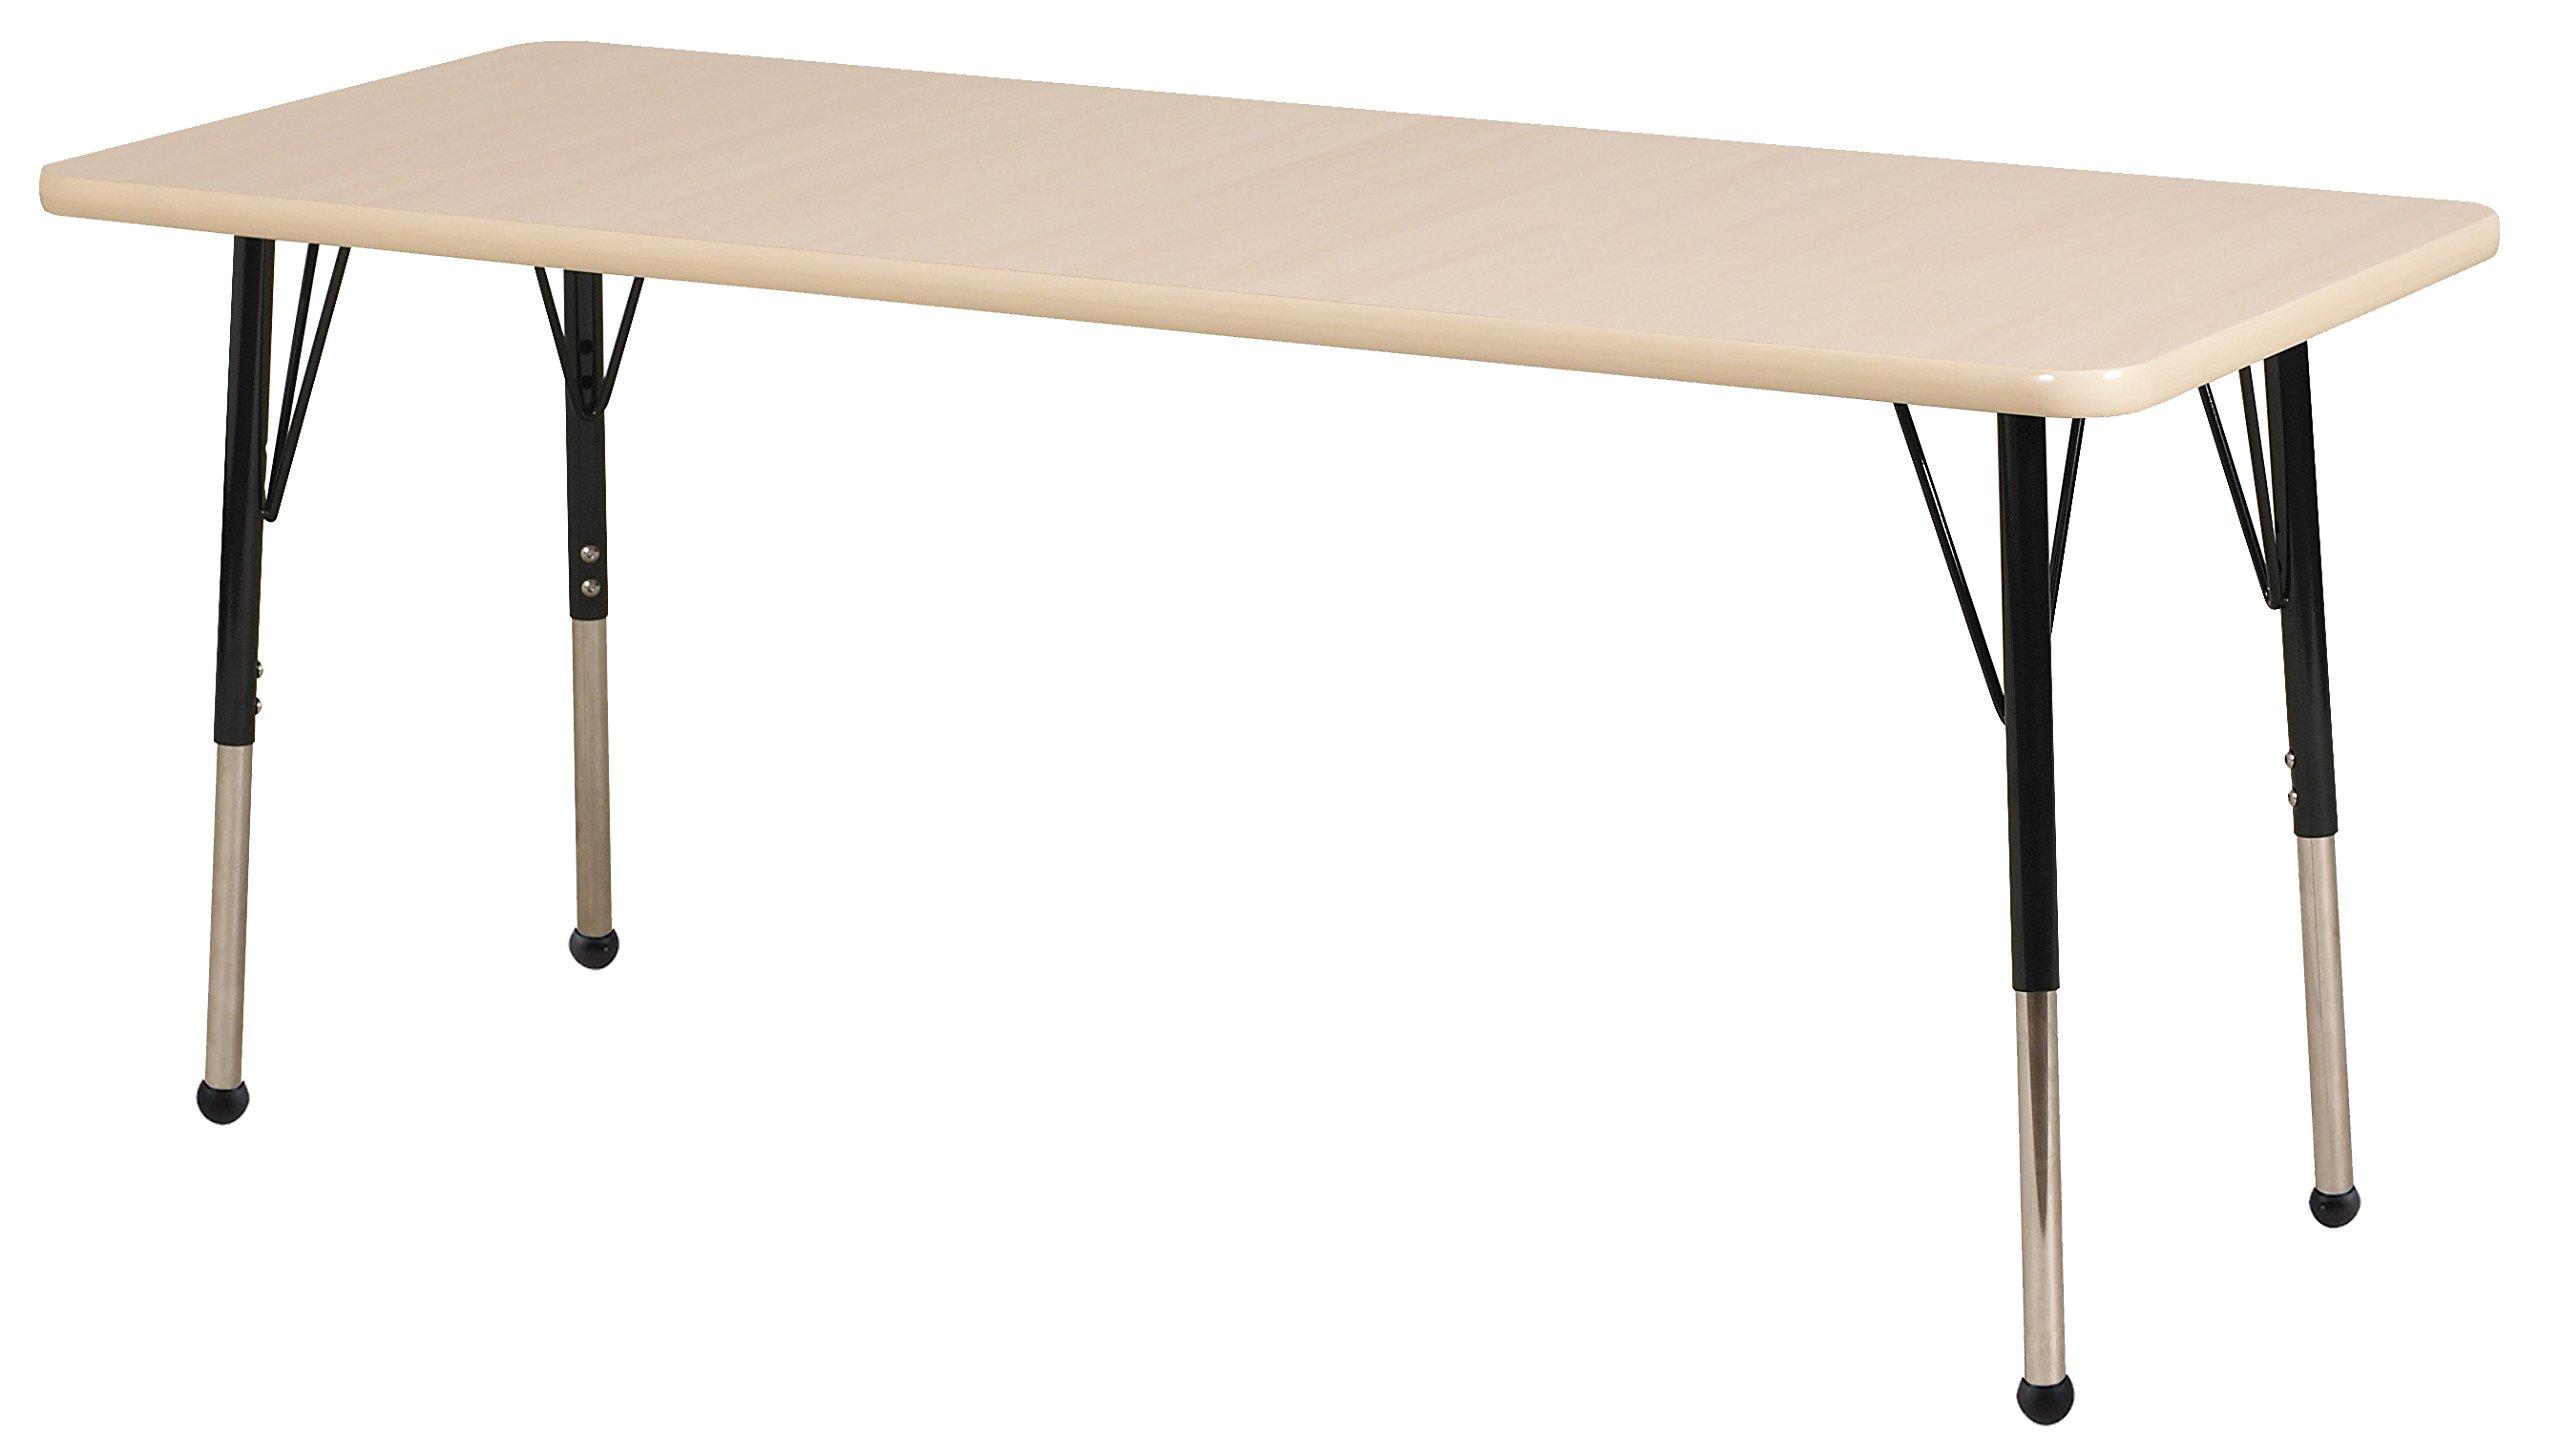 ECR4Kids T-Mold 24'' x 60'' Rectangular Activity School Table, Standard Legs w/ Ball Glides, Adjustable Height 19-30 inch (Maple/Black)